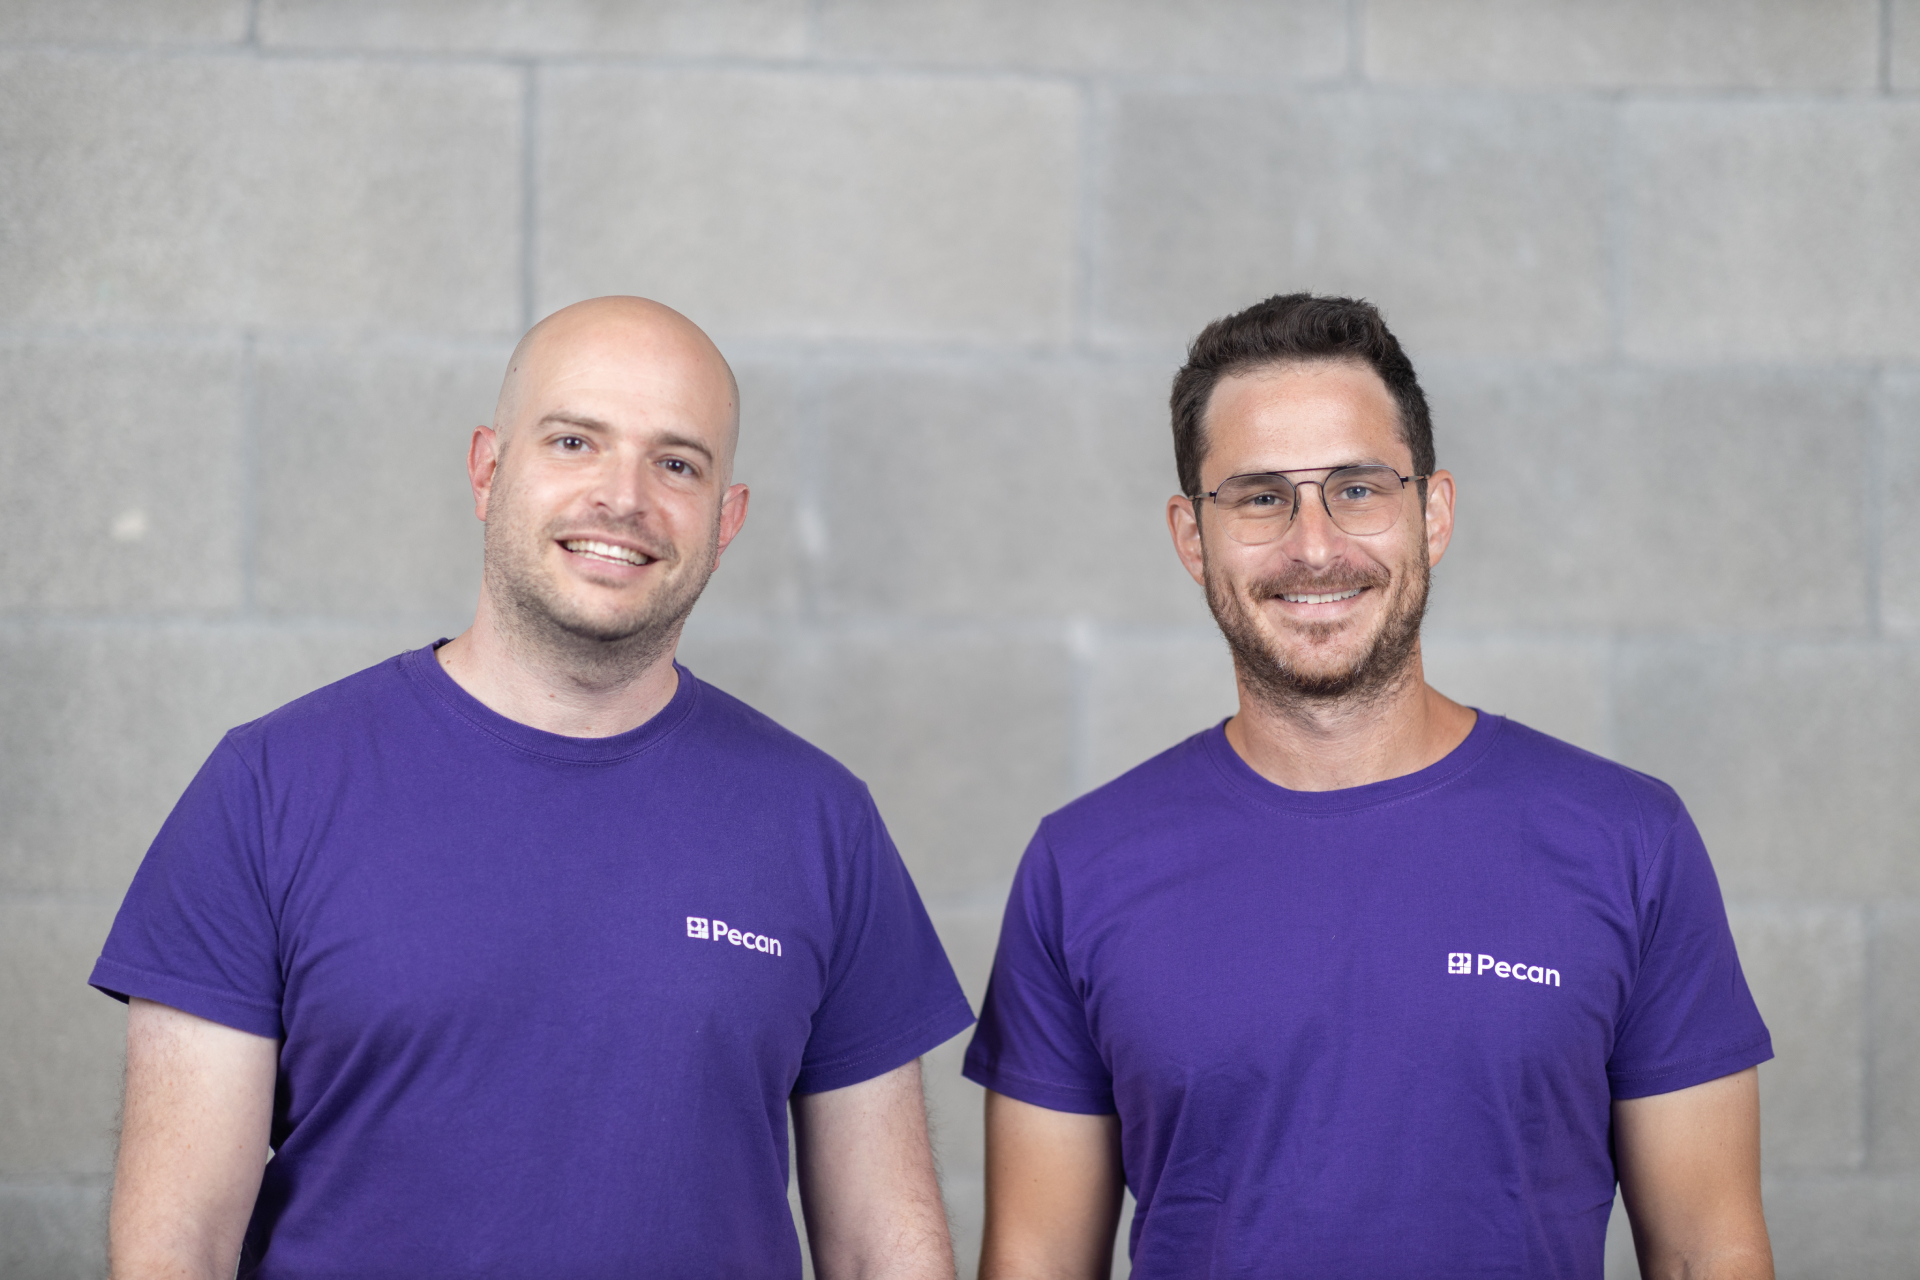 Pecan AI co-founders Noam Brezis (left) and Zohar Bronfman. Photo: Avishai Lippner